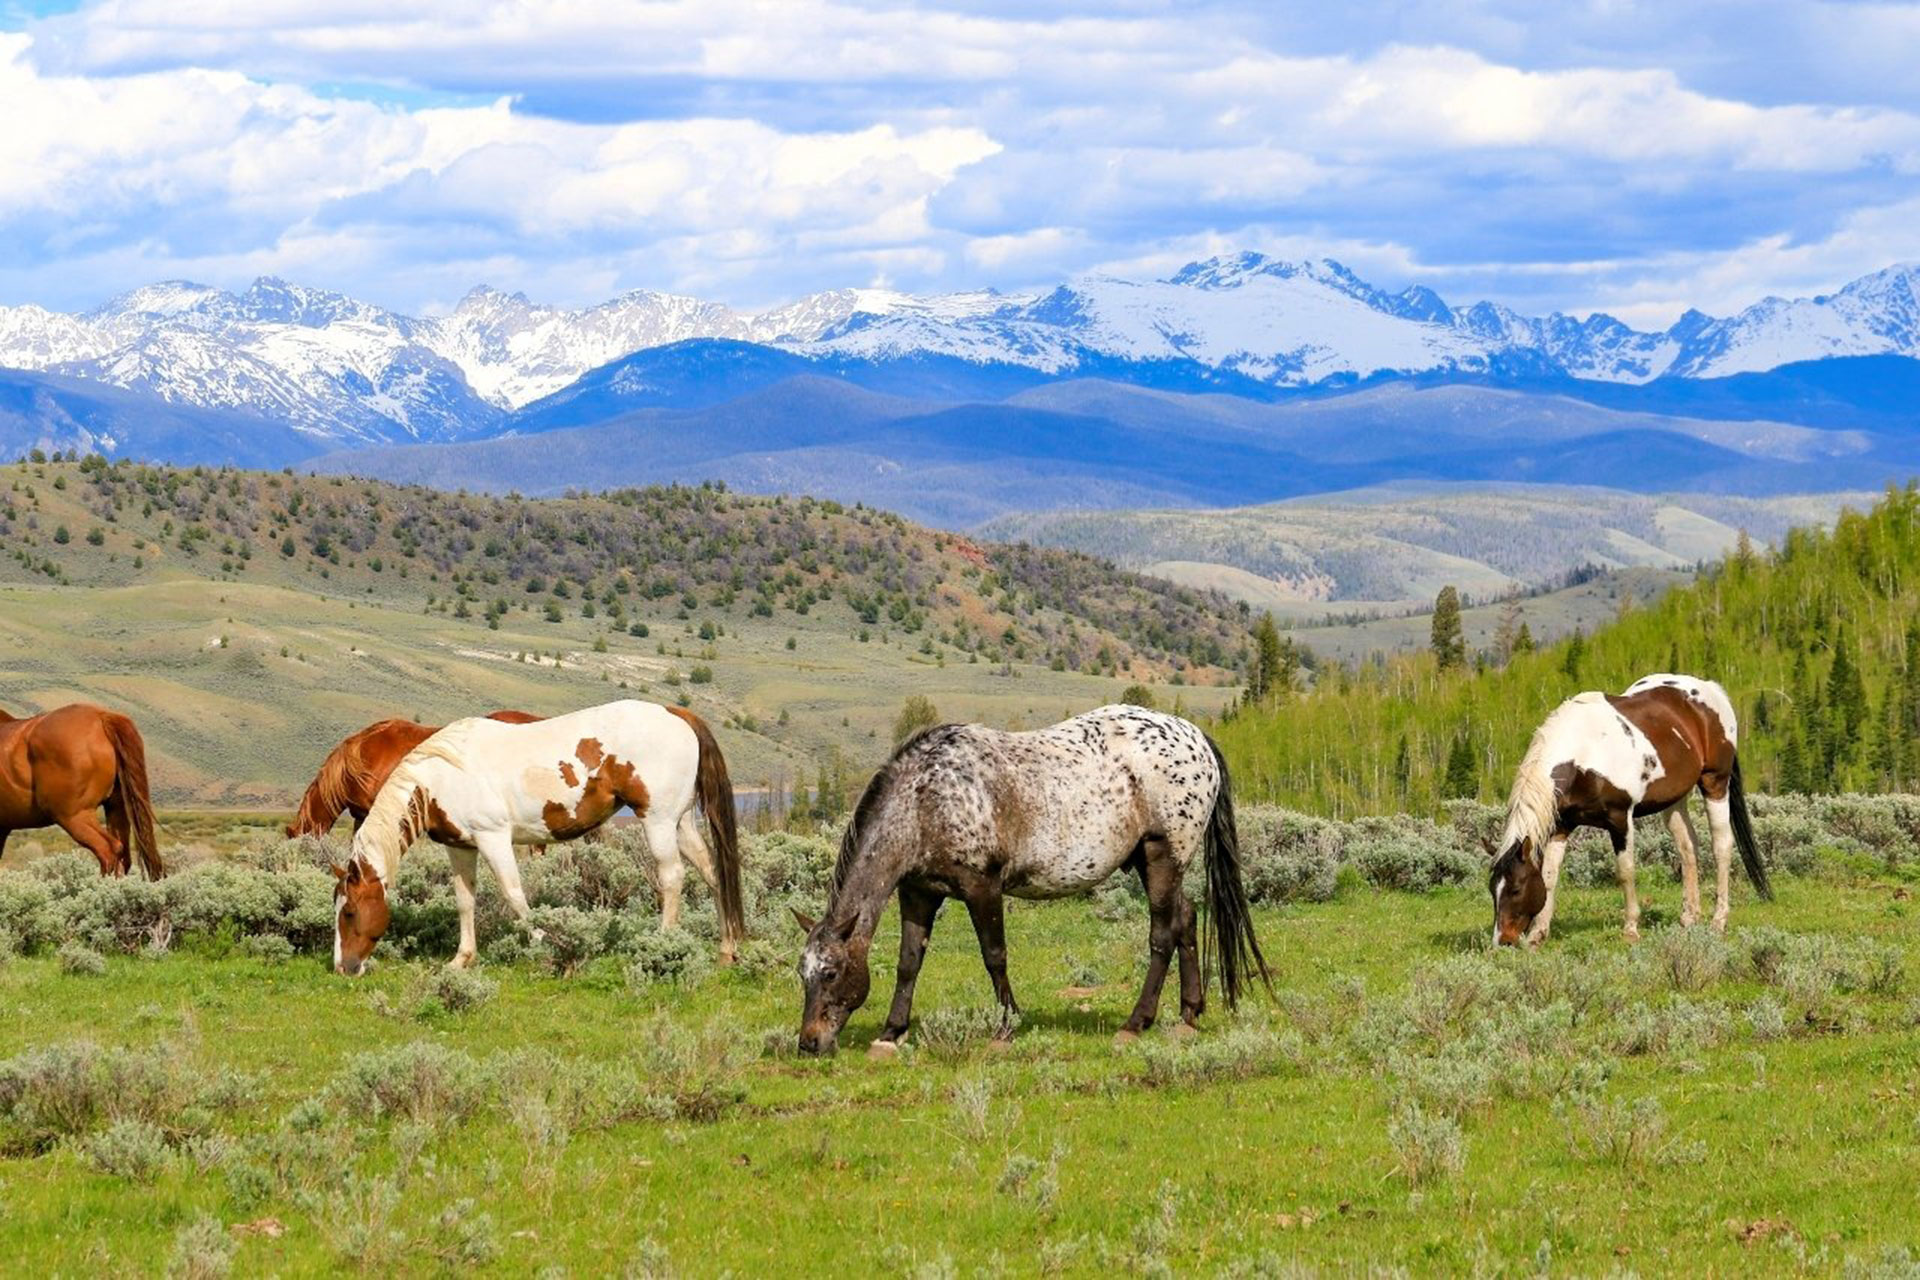 Horses at C Lazy U Ranch in Granby, Colorado; Courtesy of C U Lazy Ranch